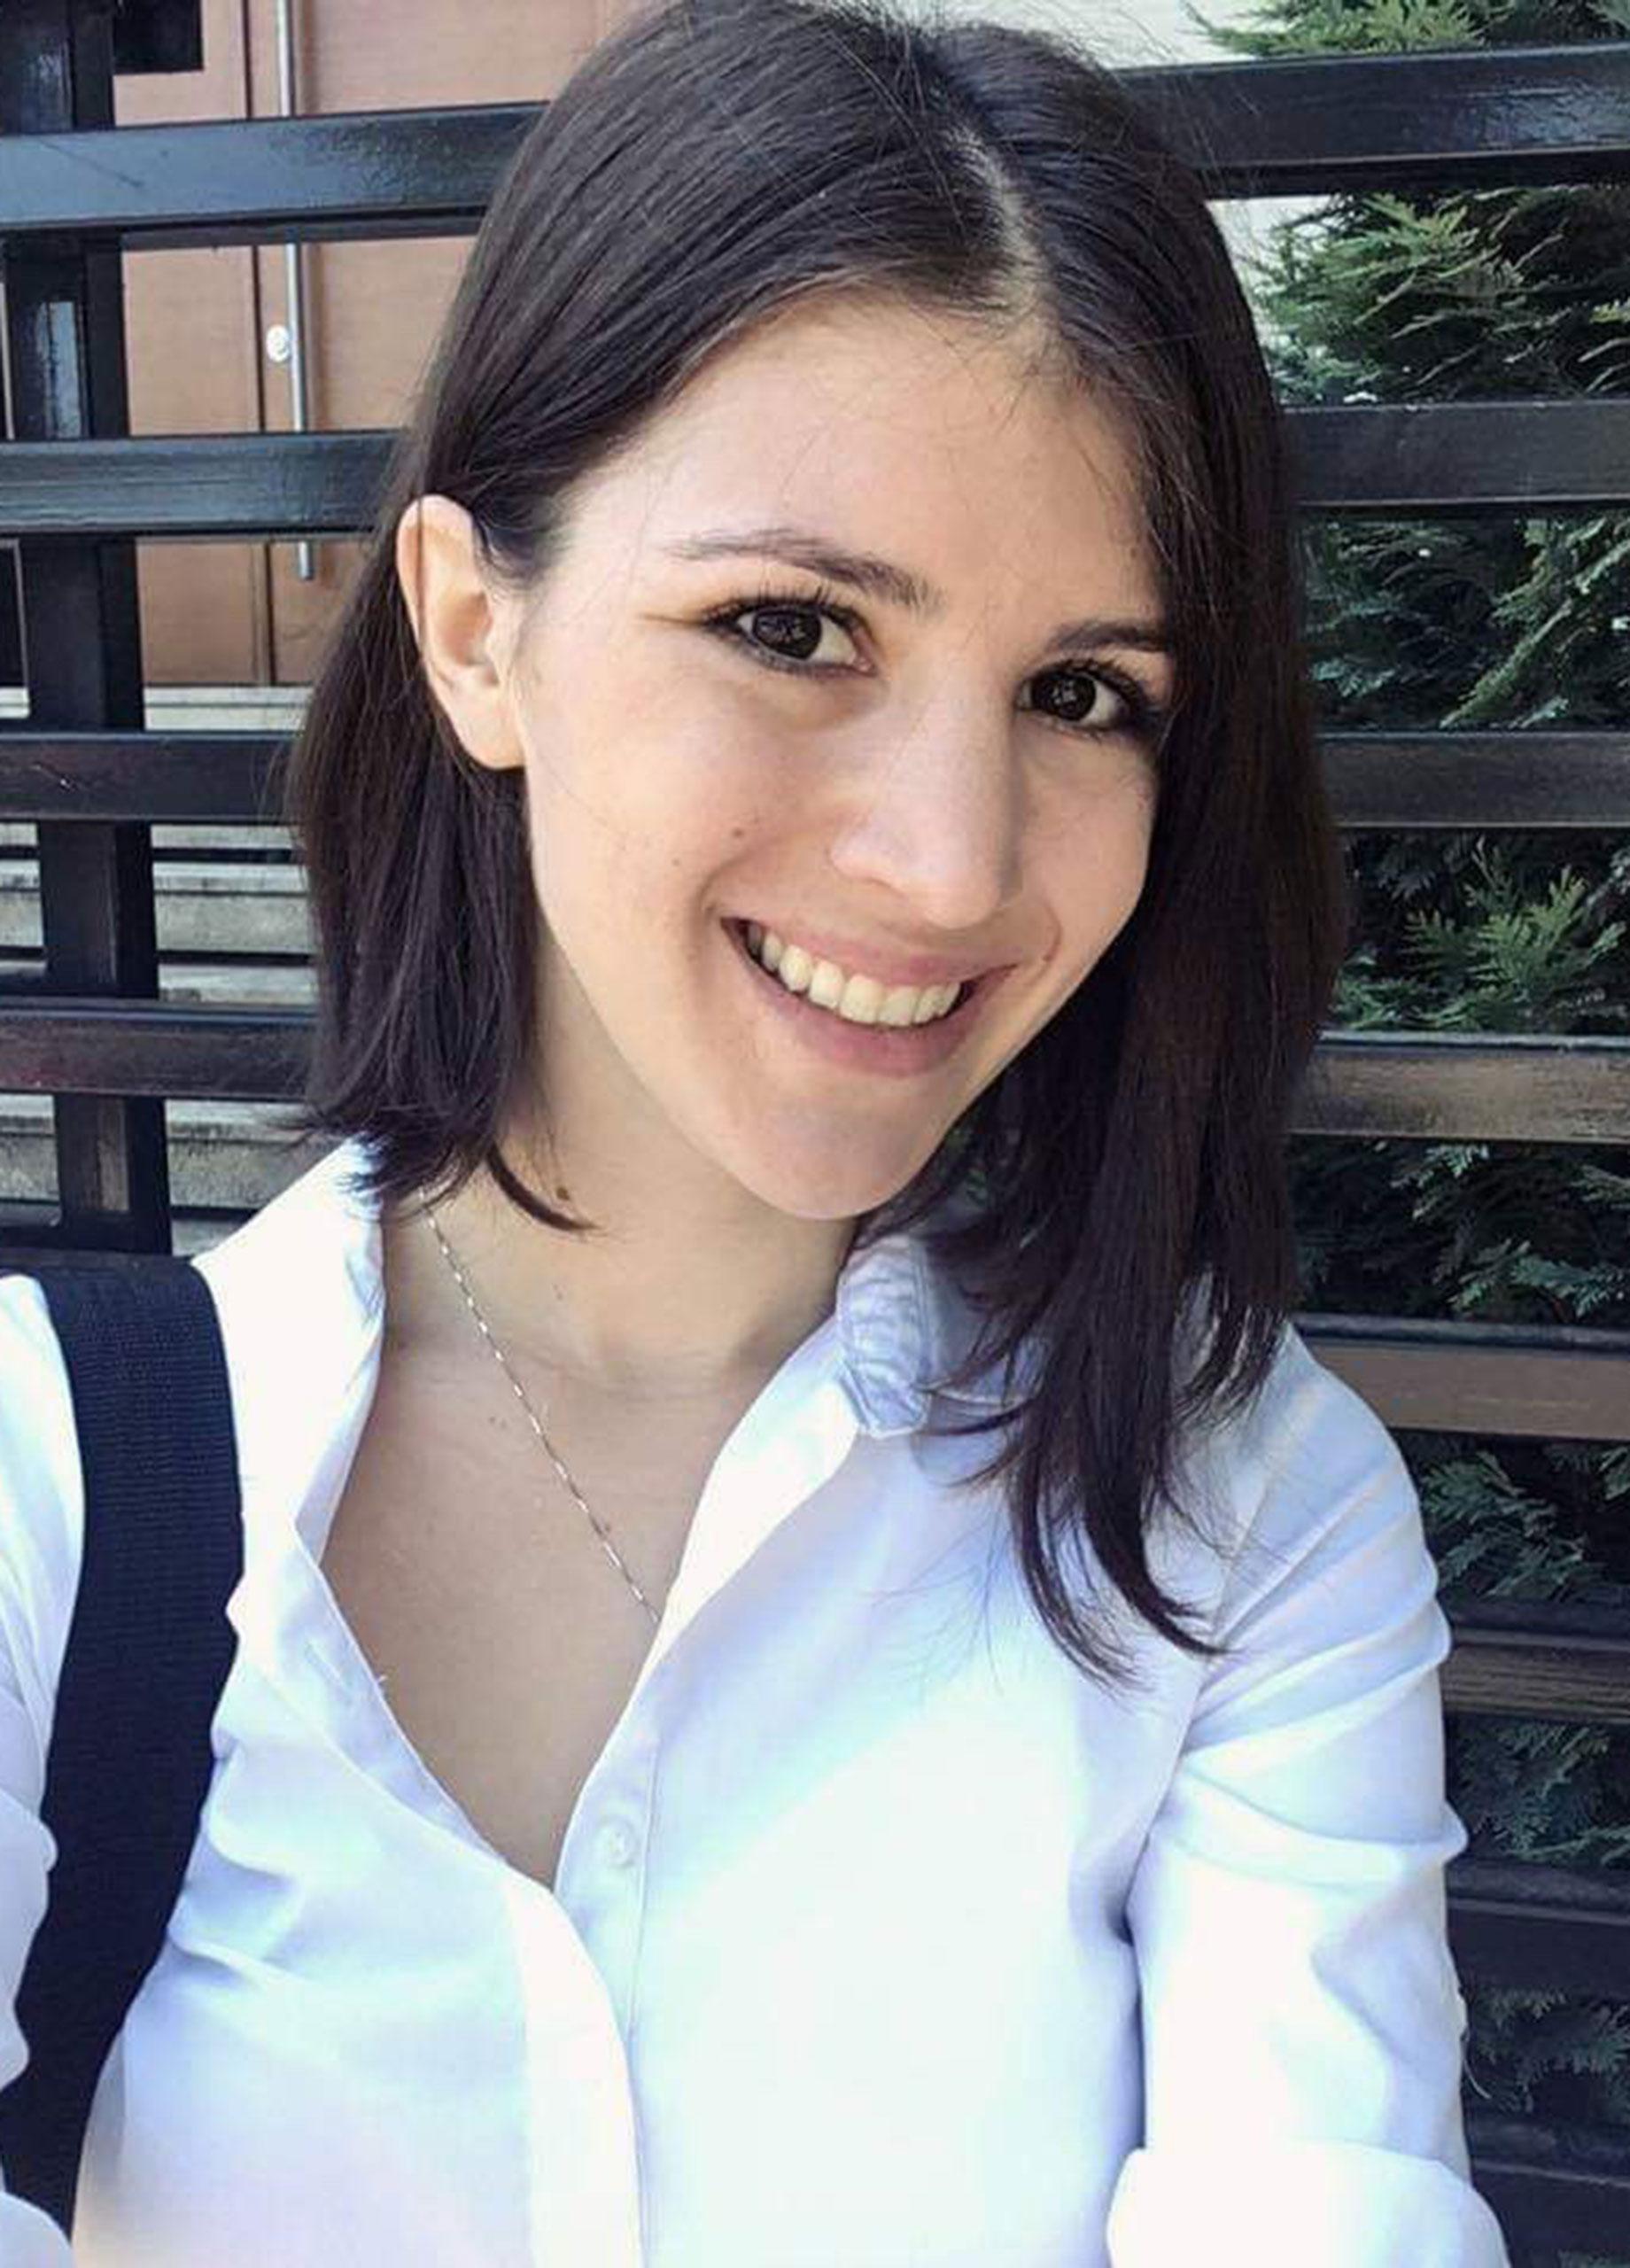 Jelena Mircetic, Business Analyst